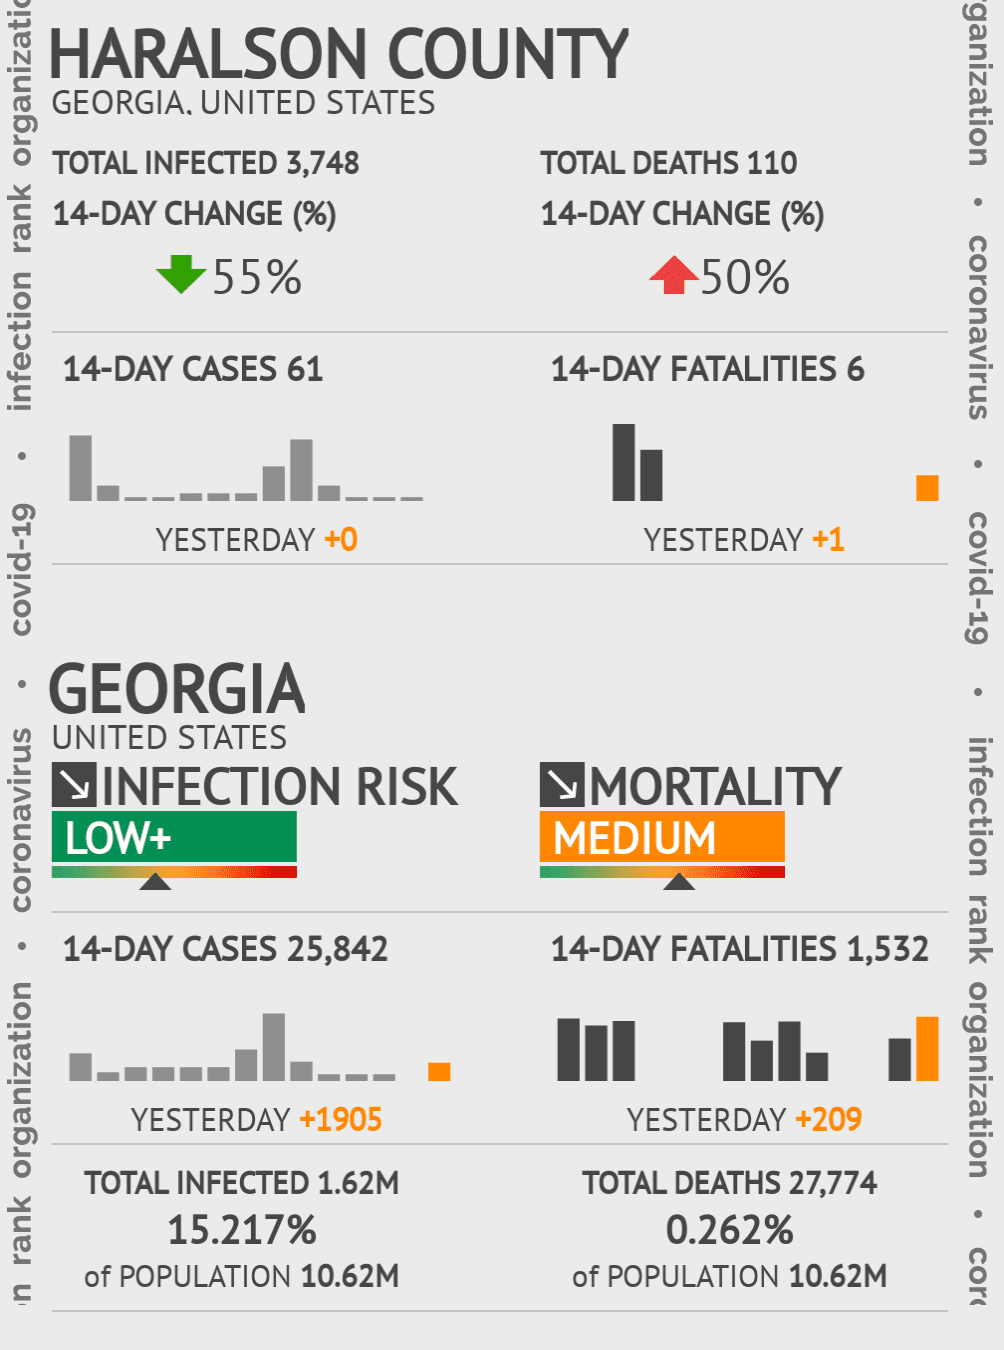 Haralson County Coronavirus Covid-19 Risk of Infection on November 29, 2020